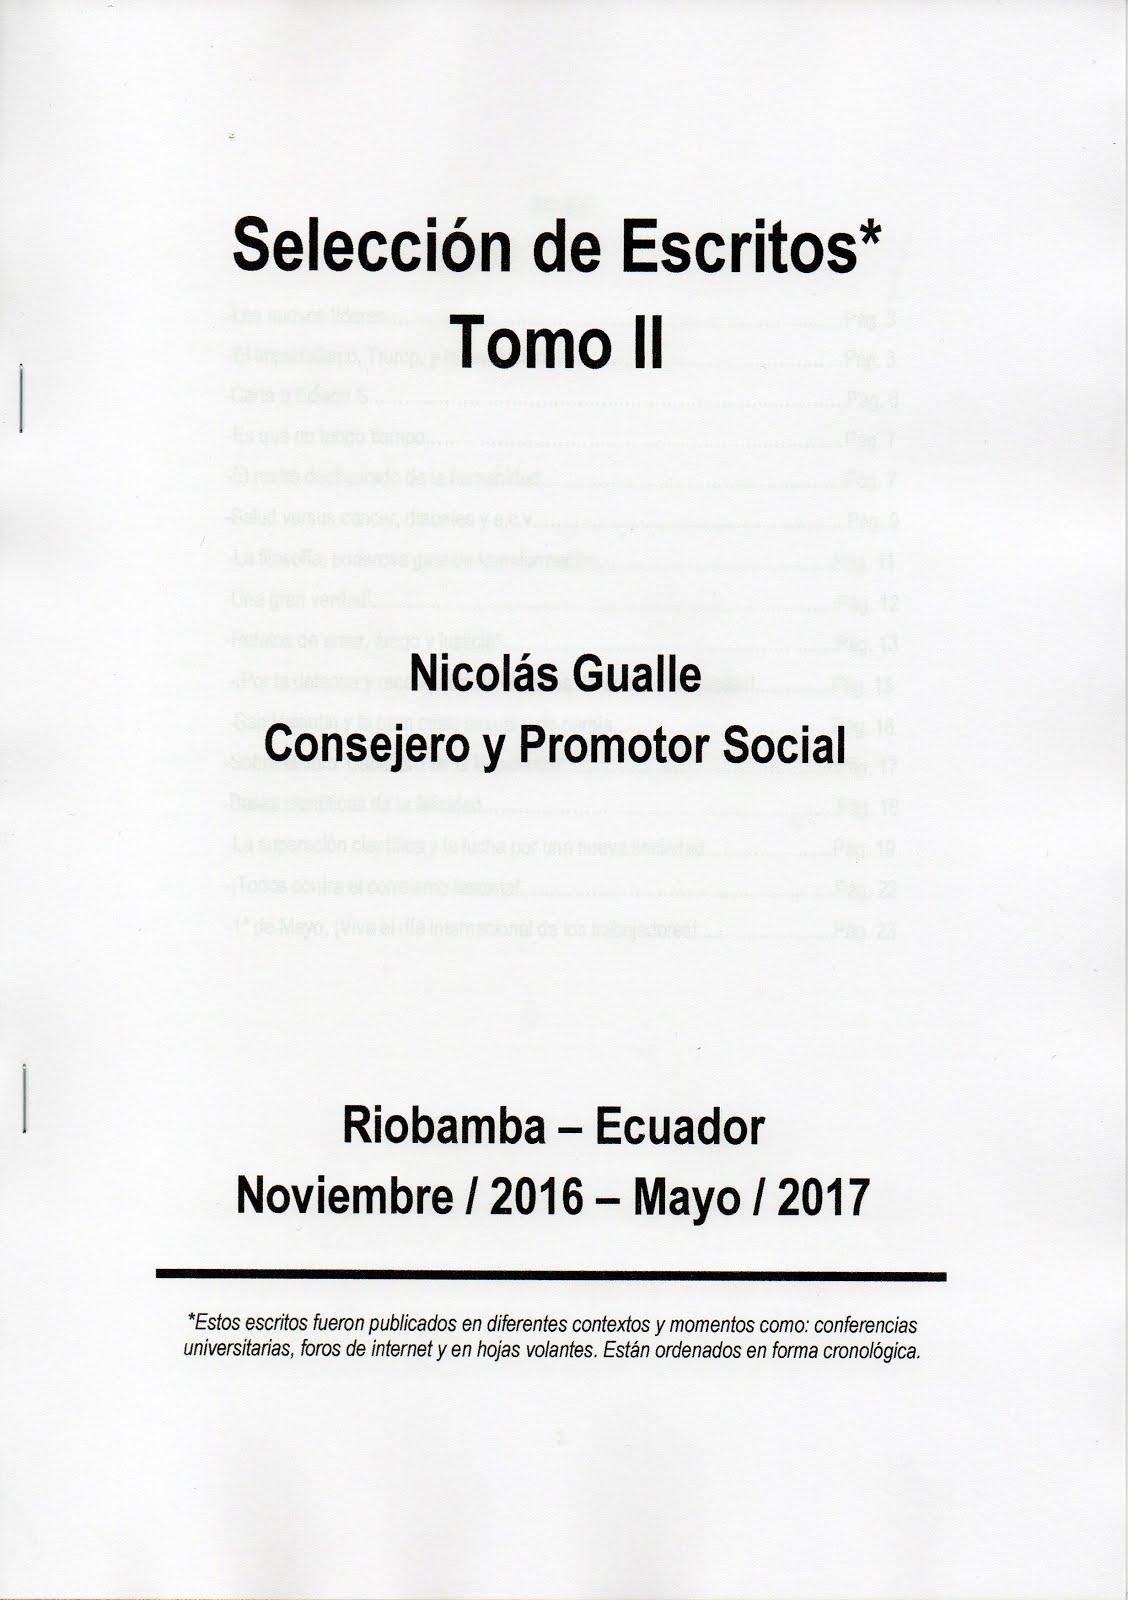 SELECCIÓN DE ESCRITOS TOMO II - NICOLÁS GUALLE